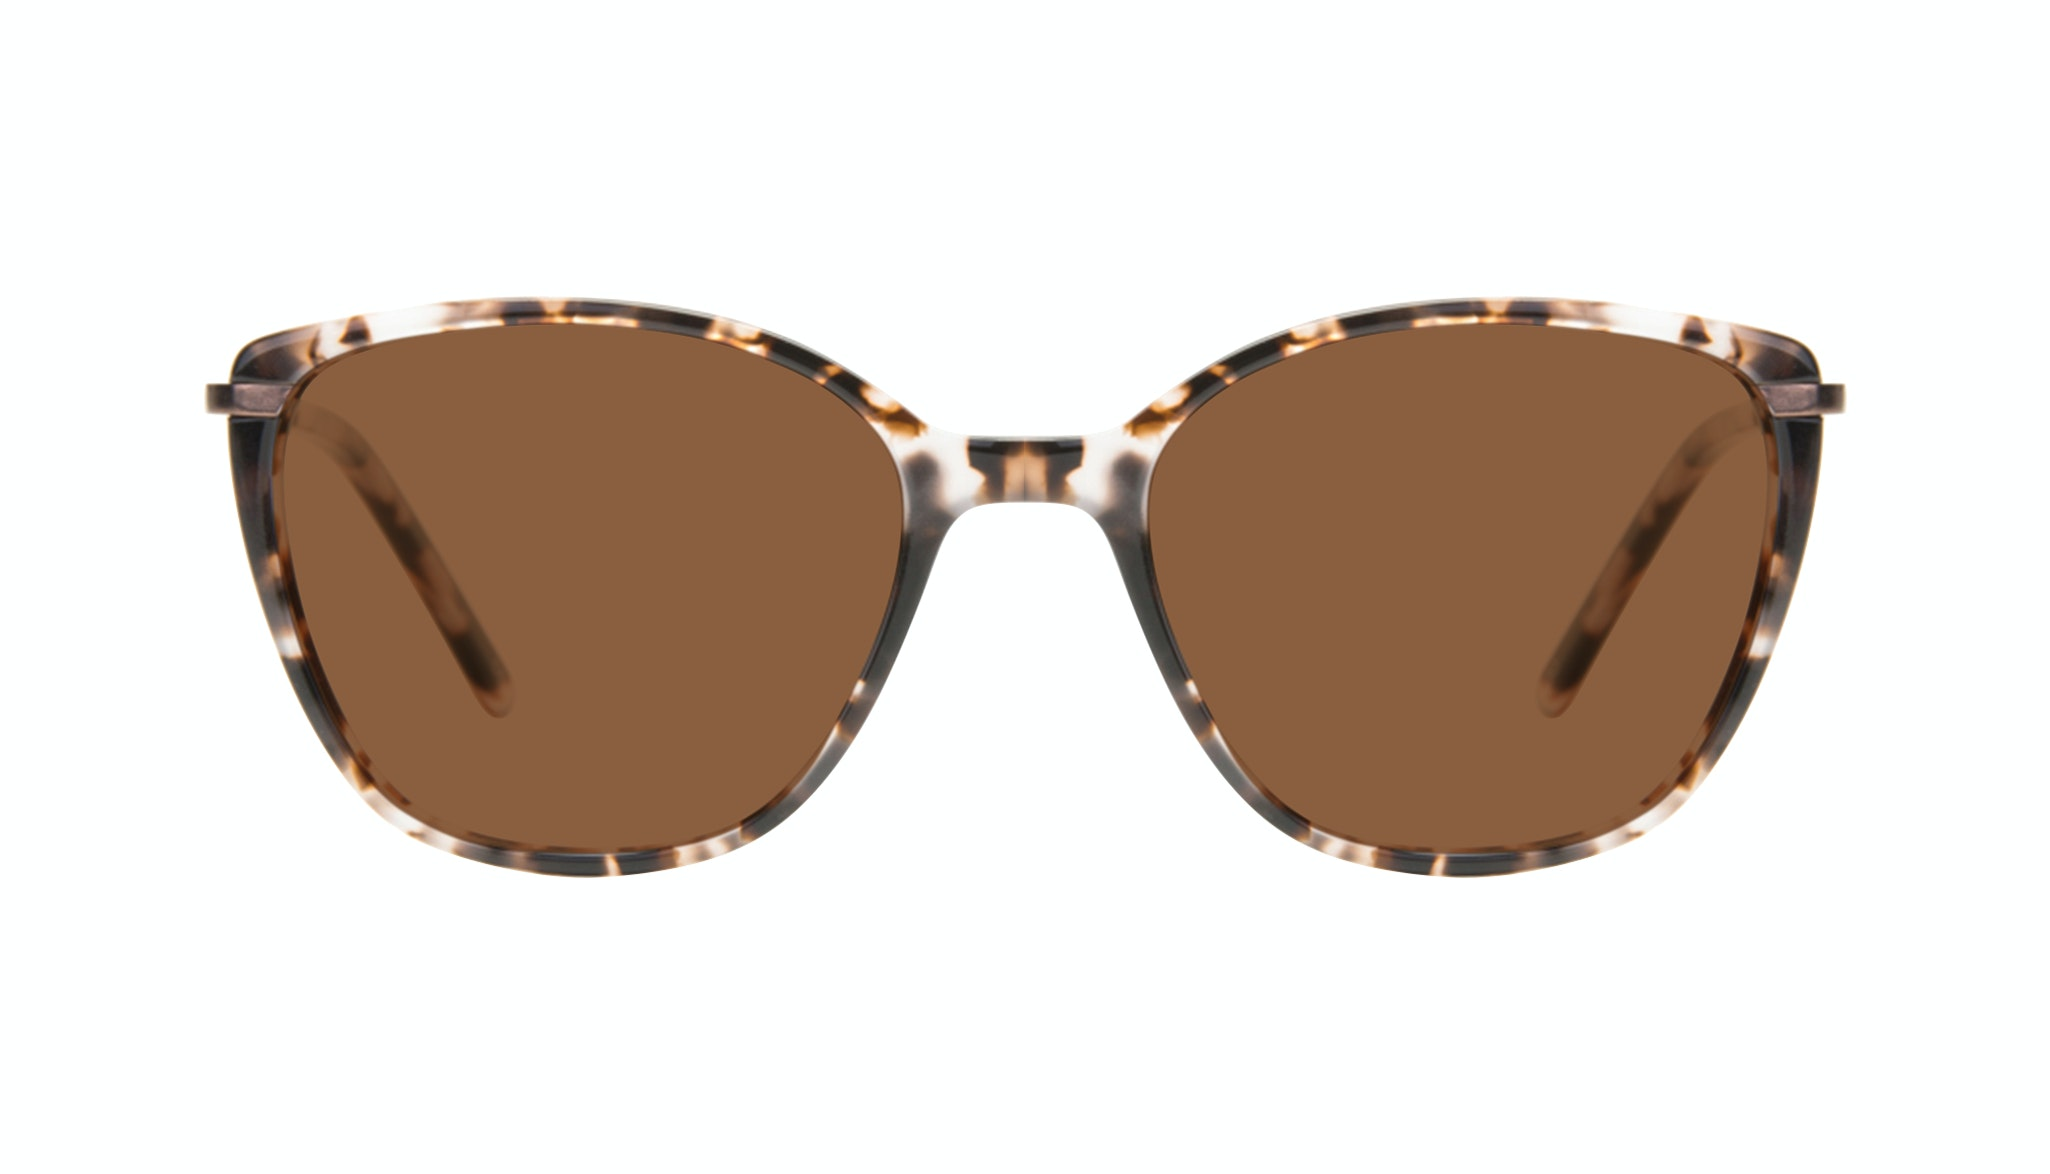 Affordable Fashion Glasses Cat Eye Rectangle Square Sunglasses Women Illusion Sand Front